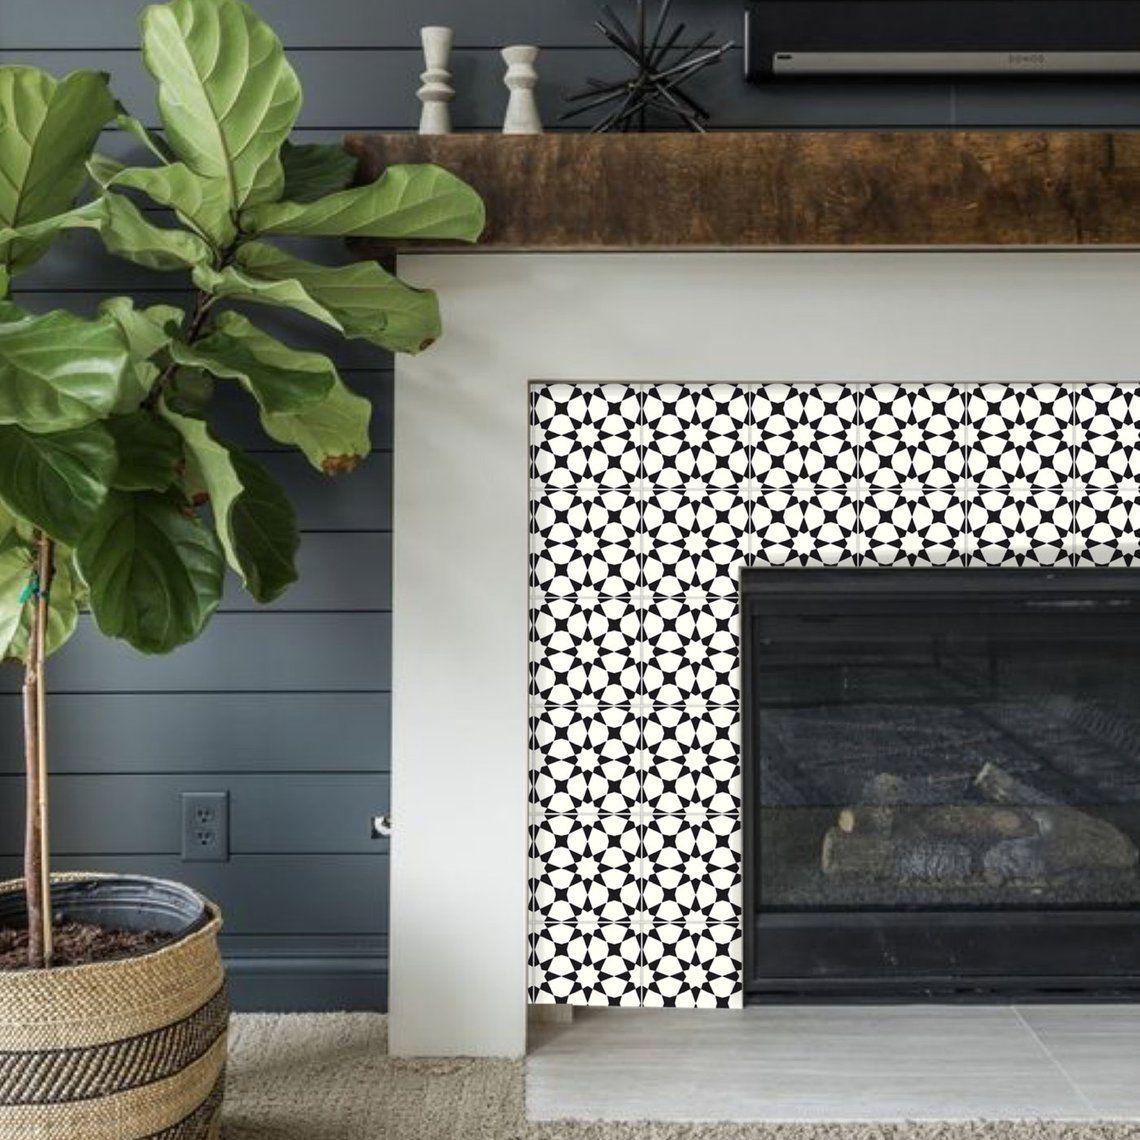 Tile Sticker Kitchen Bath Floor Fireplace Waterproof Removable Peel N Stick Bx302 Tile Stickers Kitchen Fireplace Tile Fireplace Tile Surround